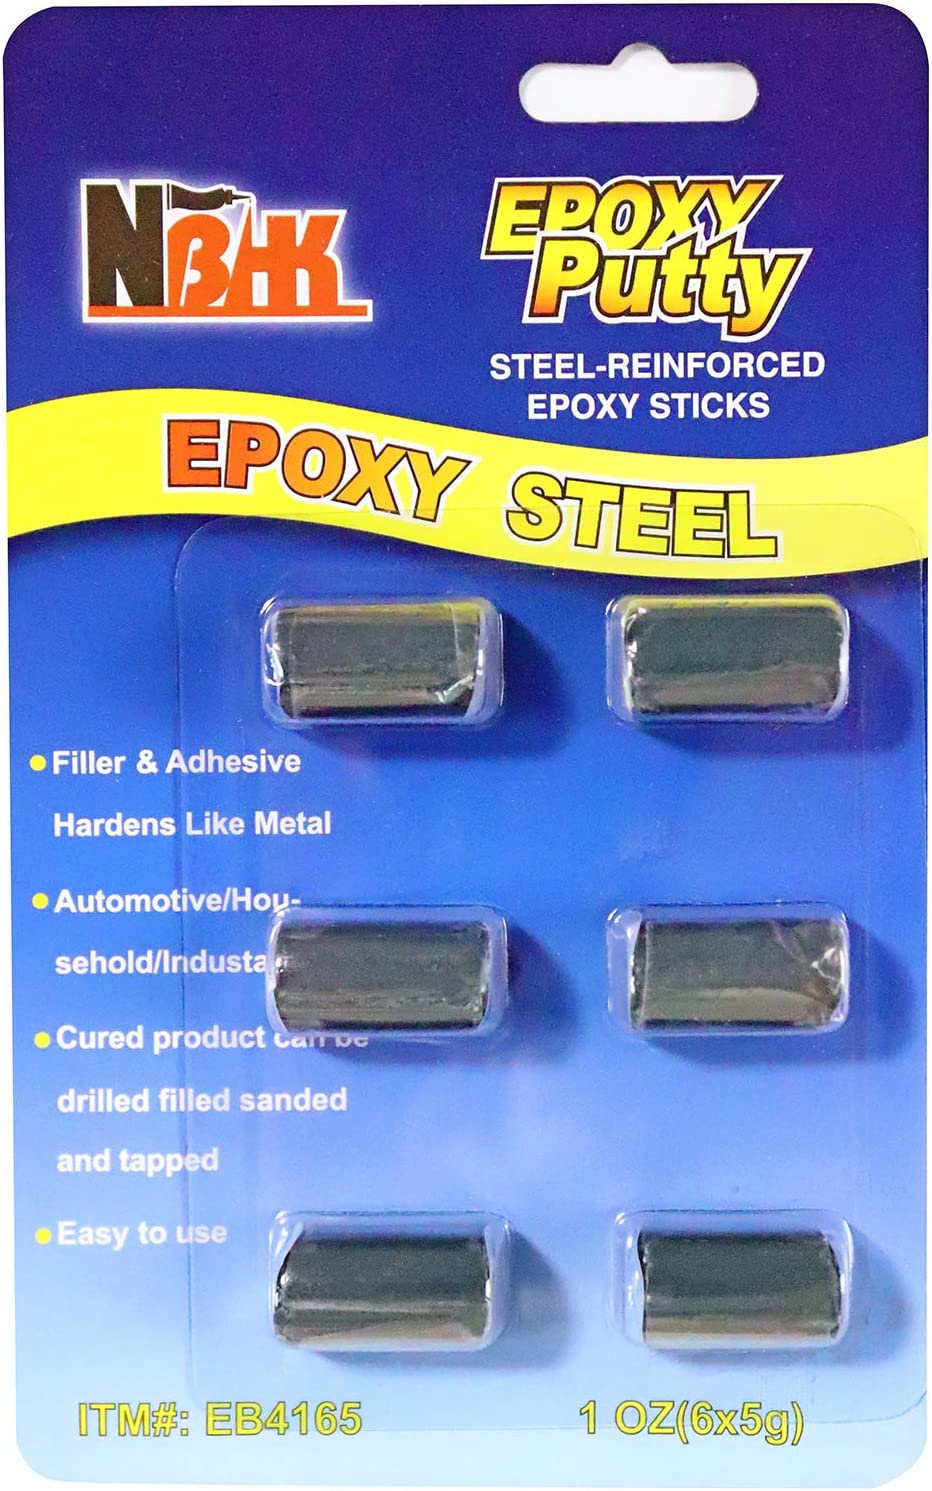 Barra Epóxica, XUDOAI Epoxi Adhesivo Metal, Plástico, Fibra de Vidrio, Sello de Relleno de Reparación de Agujeros de Grietas de Cerámica